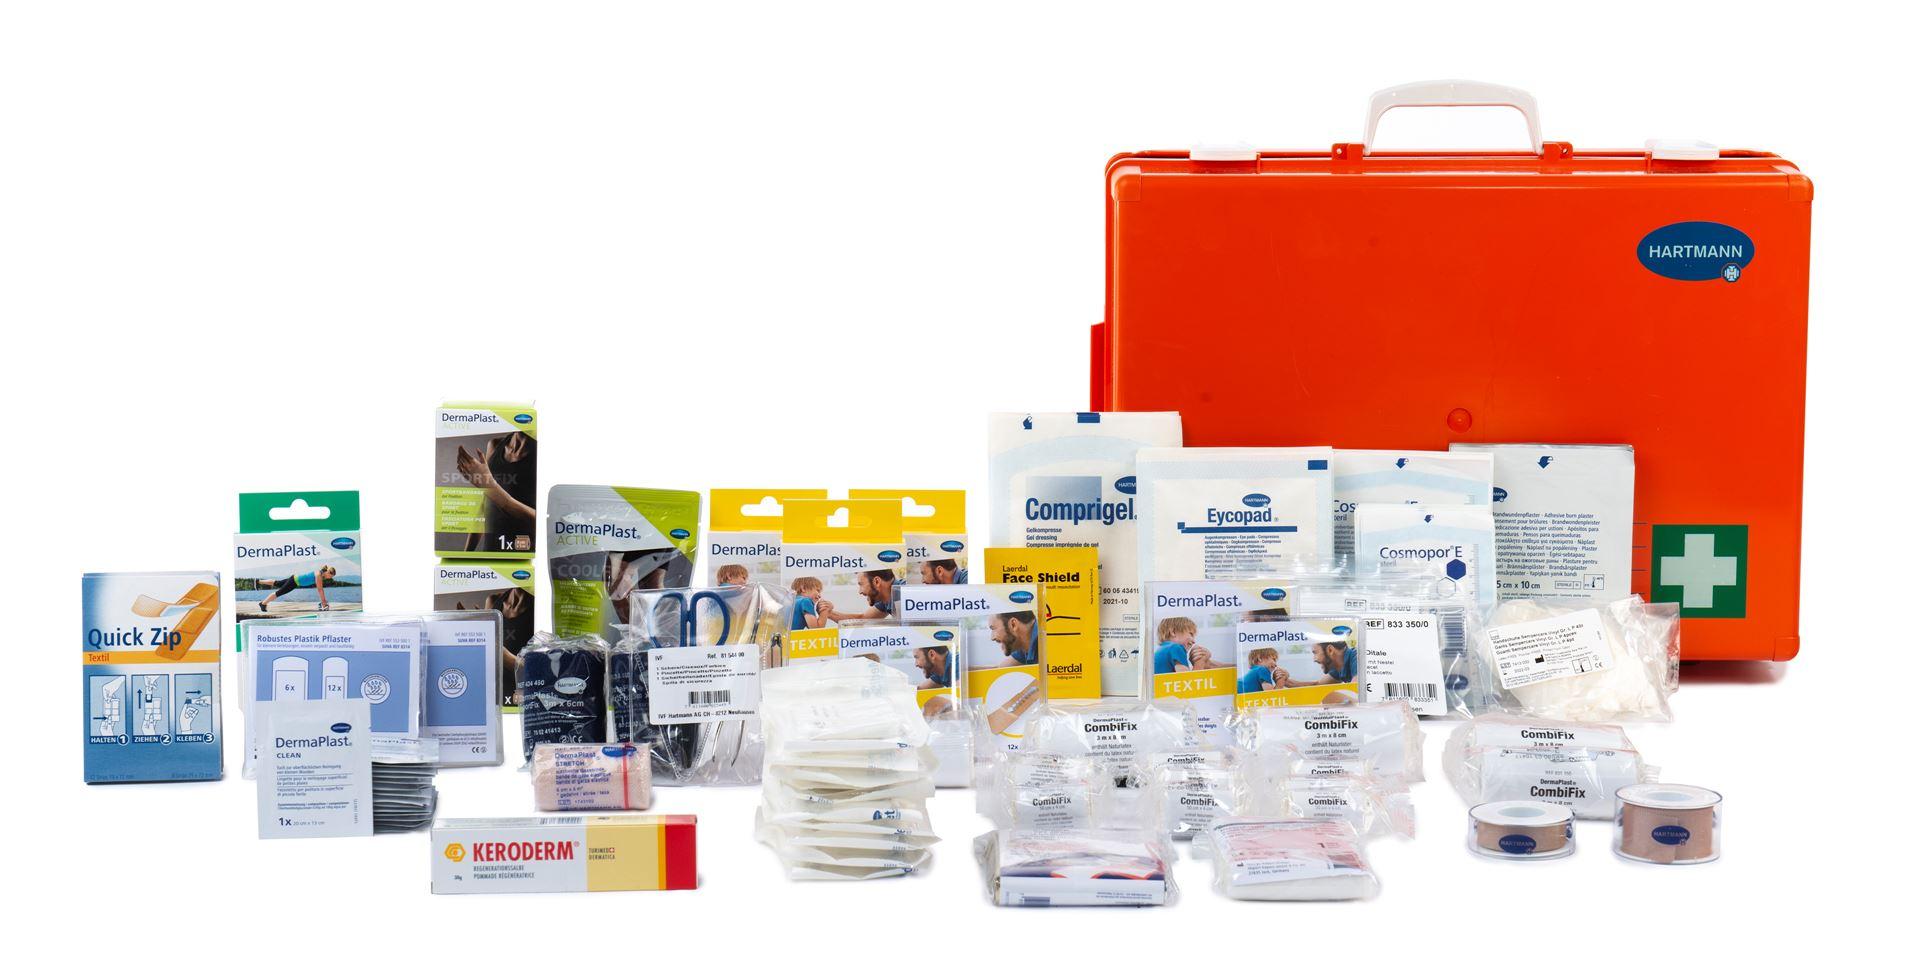 Image de la catégorie Erste-Hilfe-Apotheken